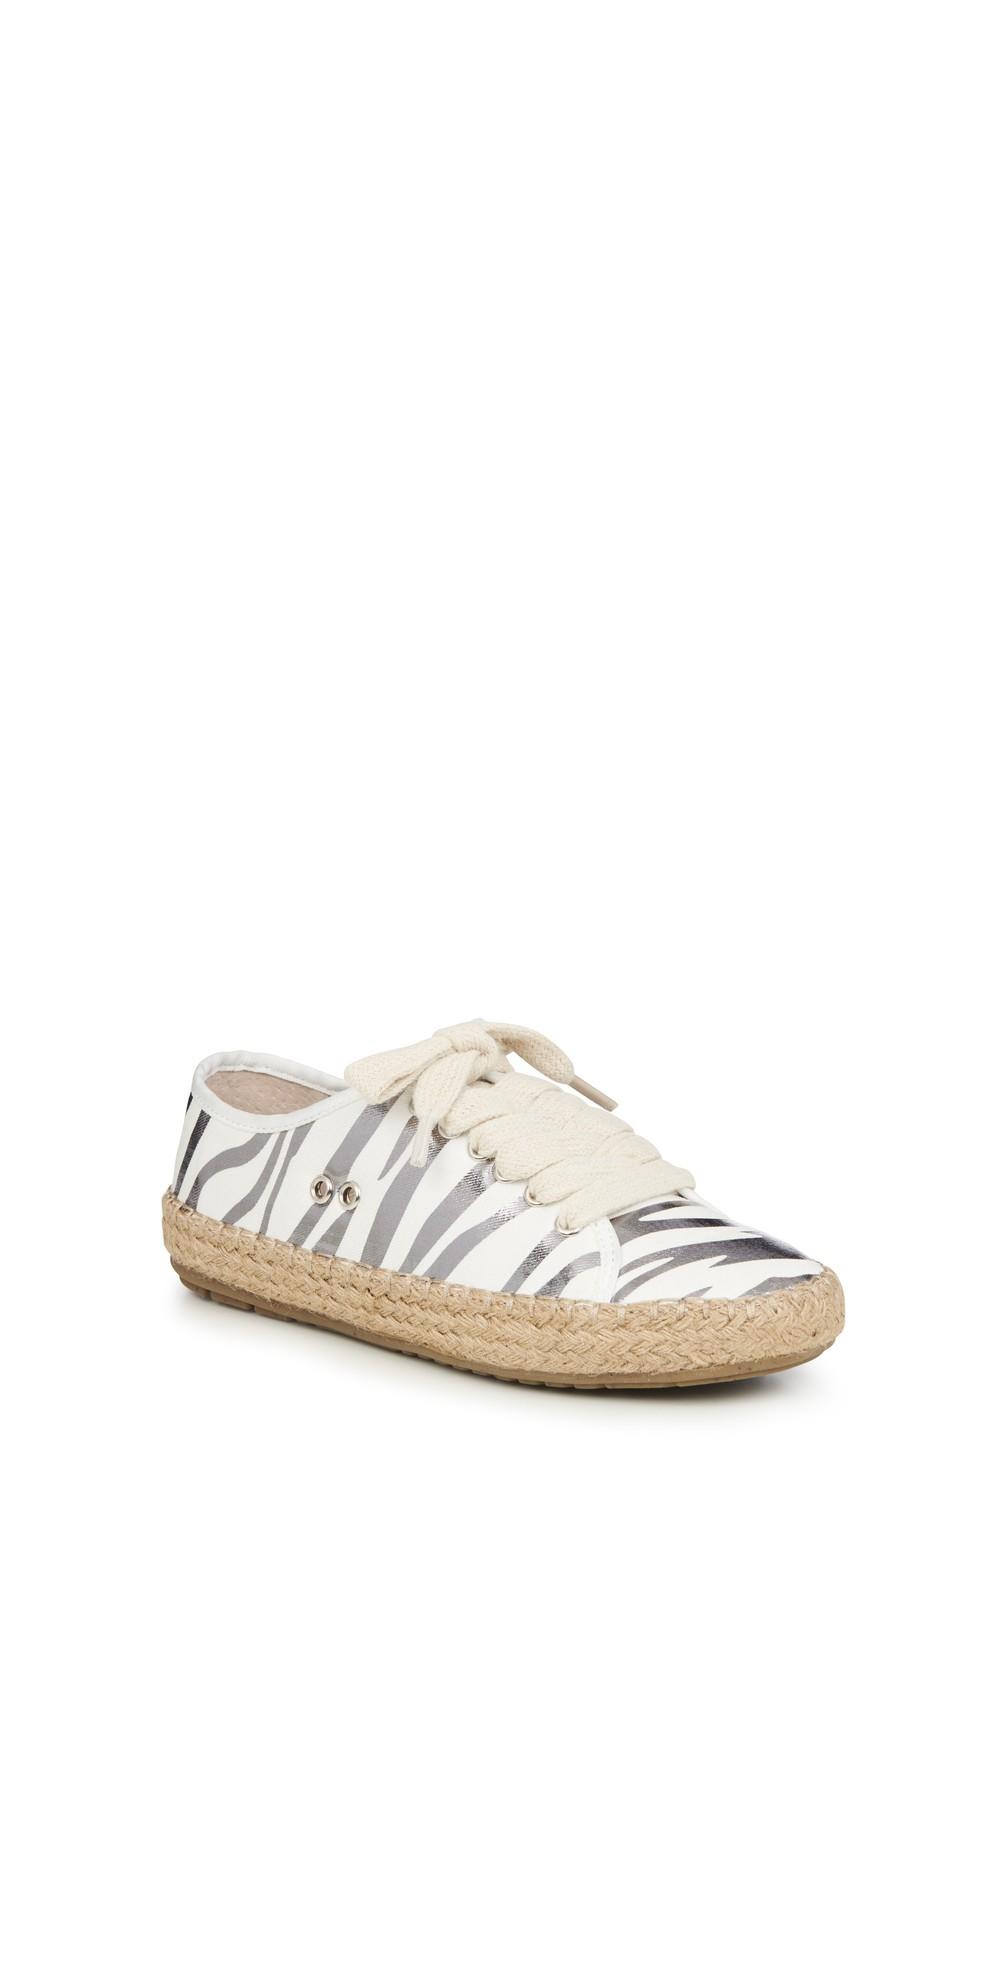 Agonis Espadrille LaceUp Shoe main image